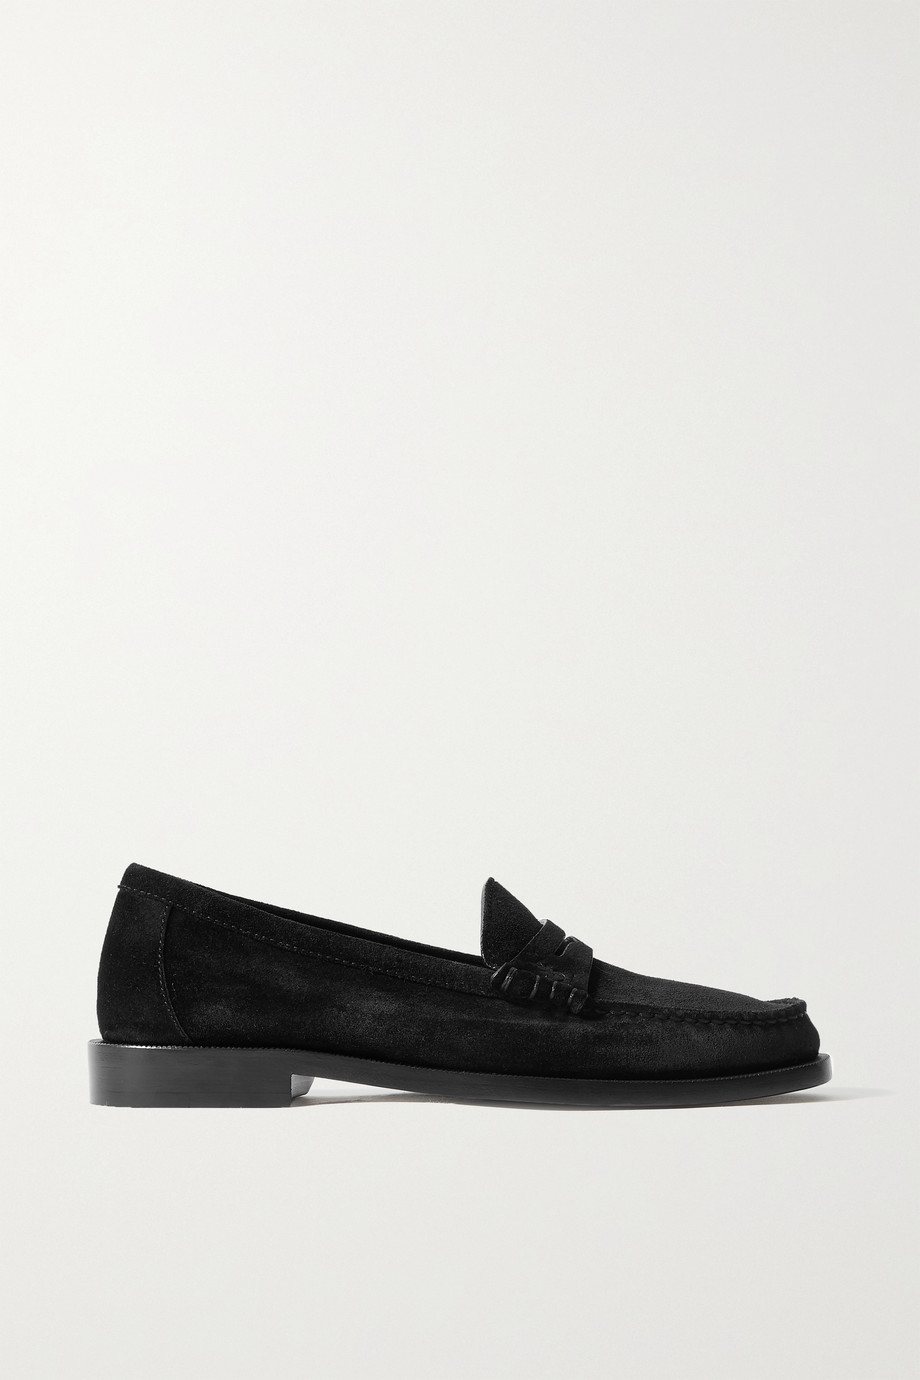 SAINT LAURENT Loafers aus Veloursleder